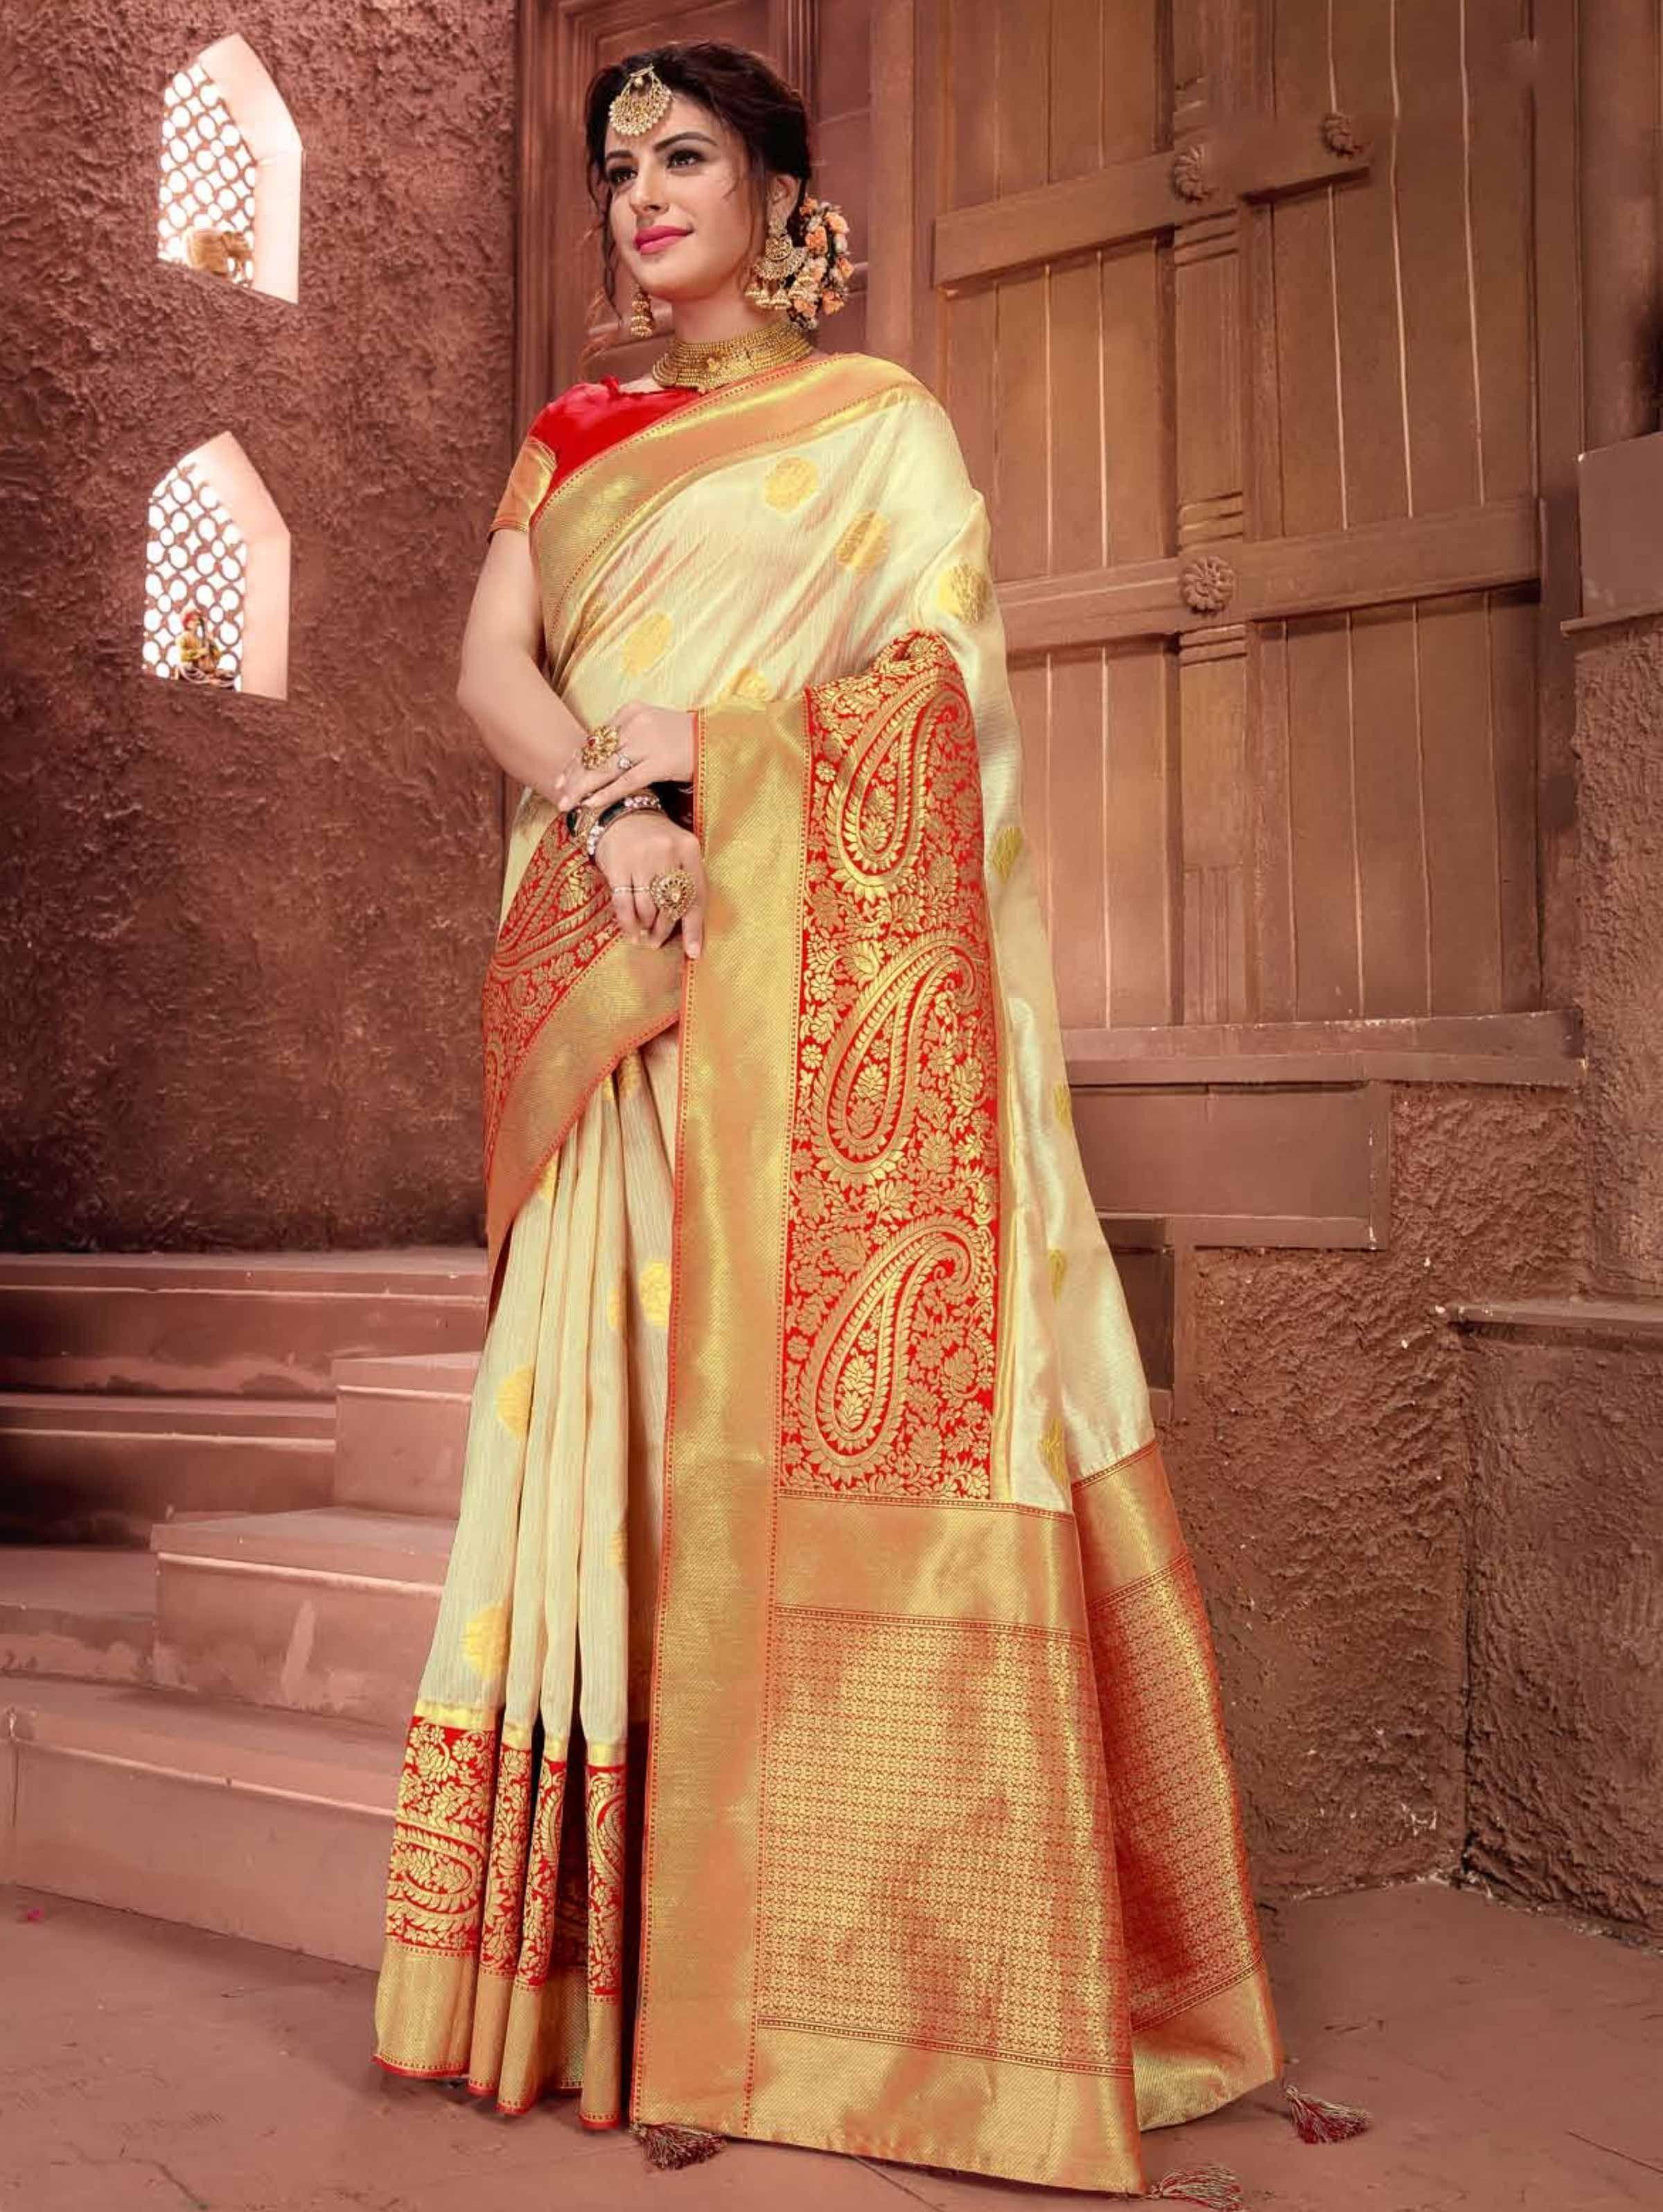 Red Wedding Saree Art Silk Jacquard Golden Silver Zari Weaving pallu Border